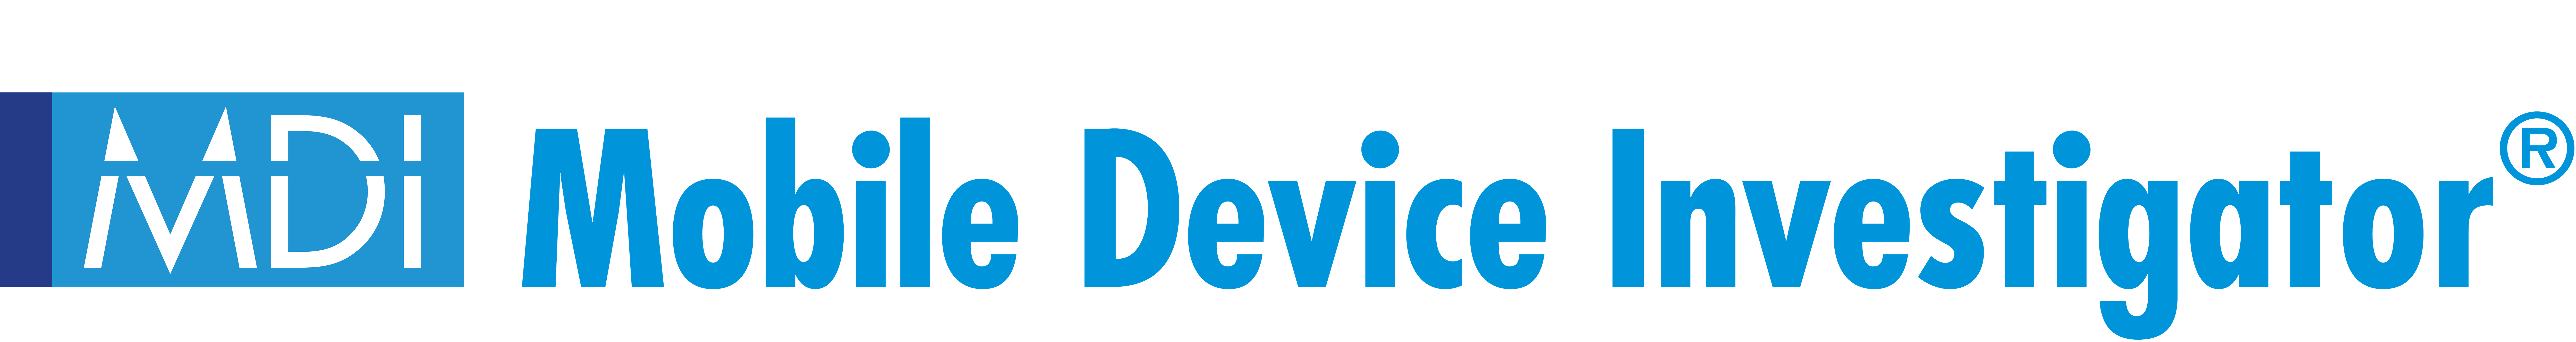 Mobile Device Investigator Logo